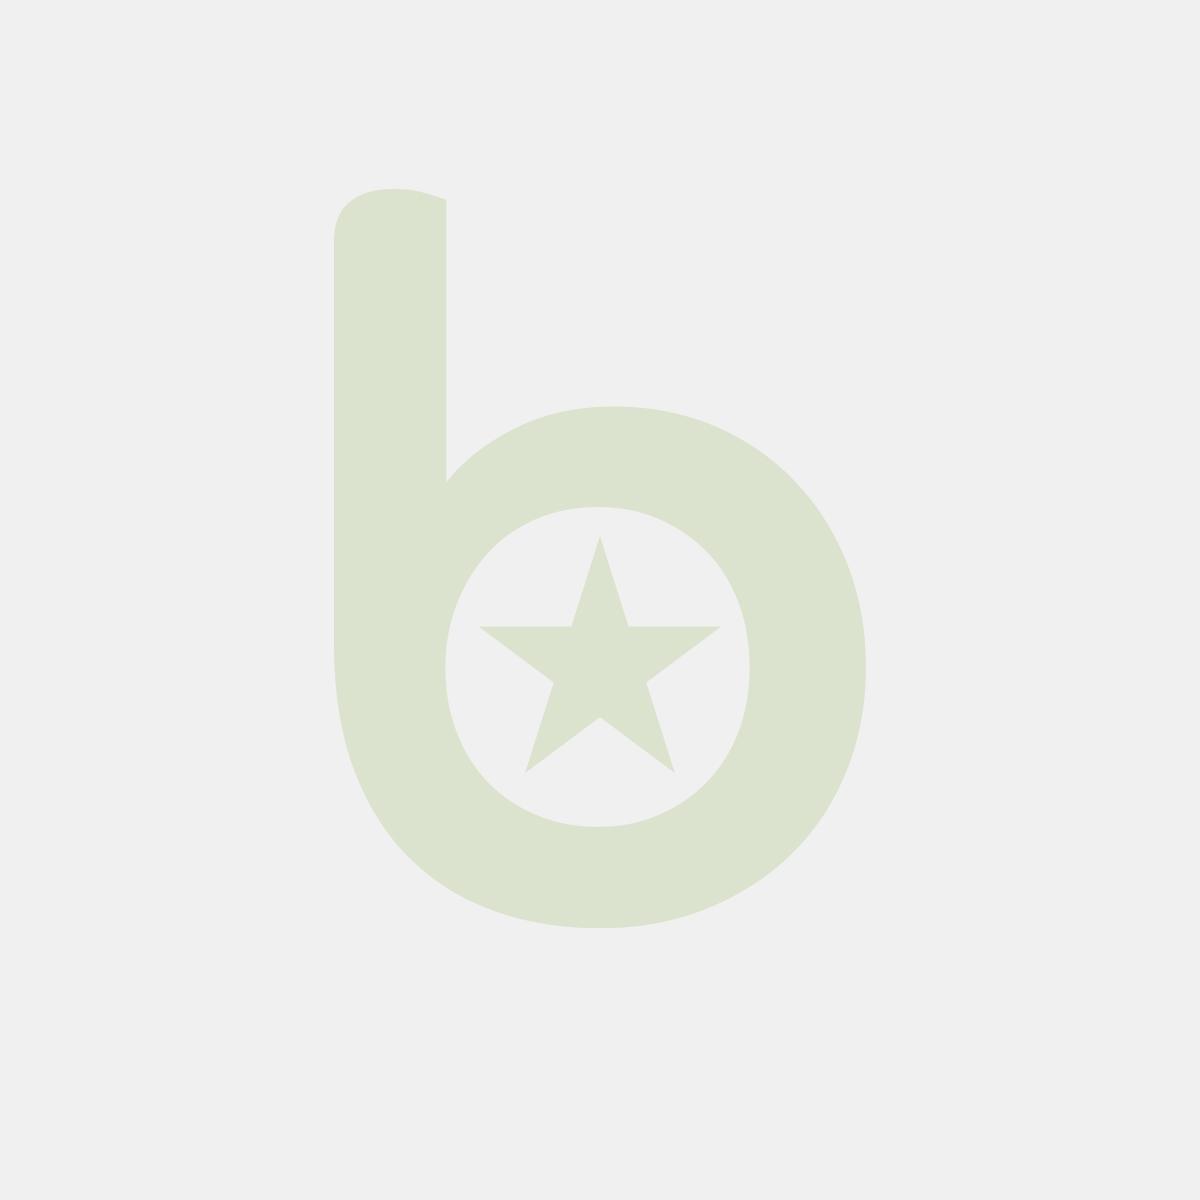 Nadstawa Chłodnicza Gn 1/4 7 X Gn 1/4